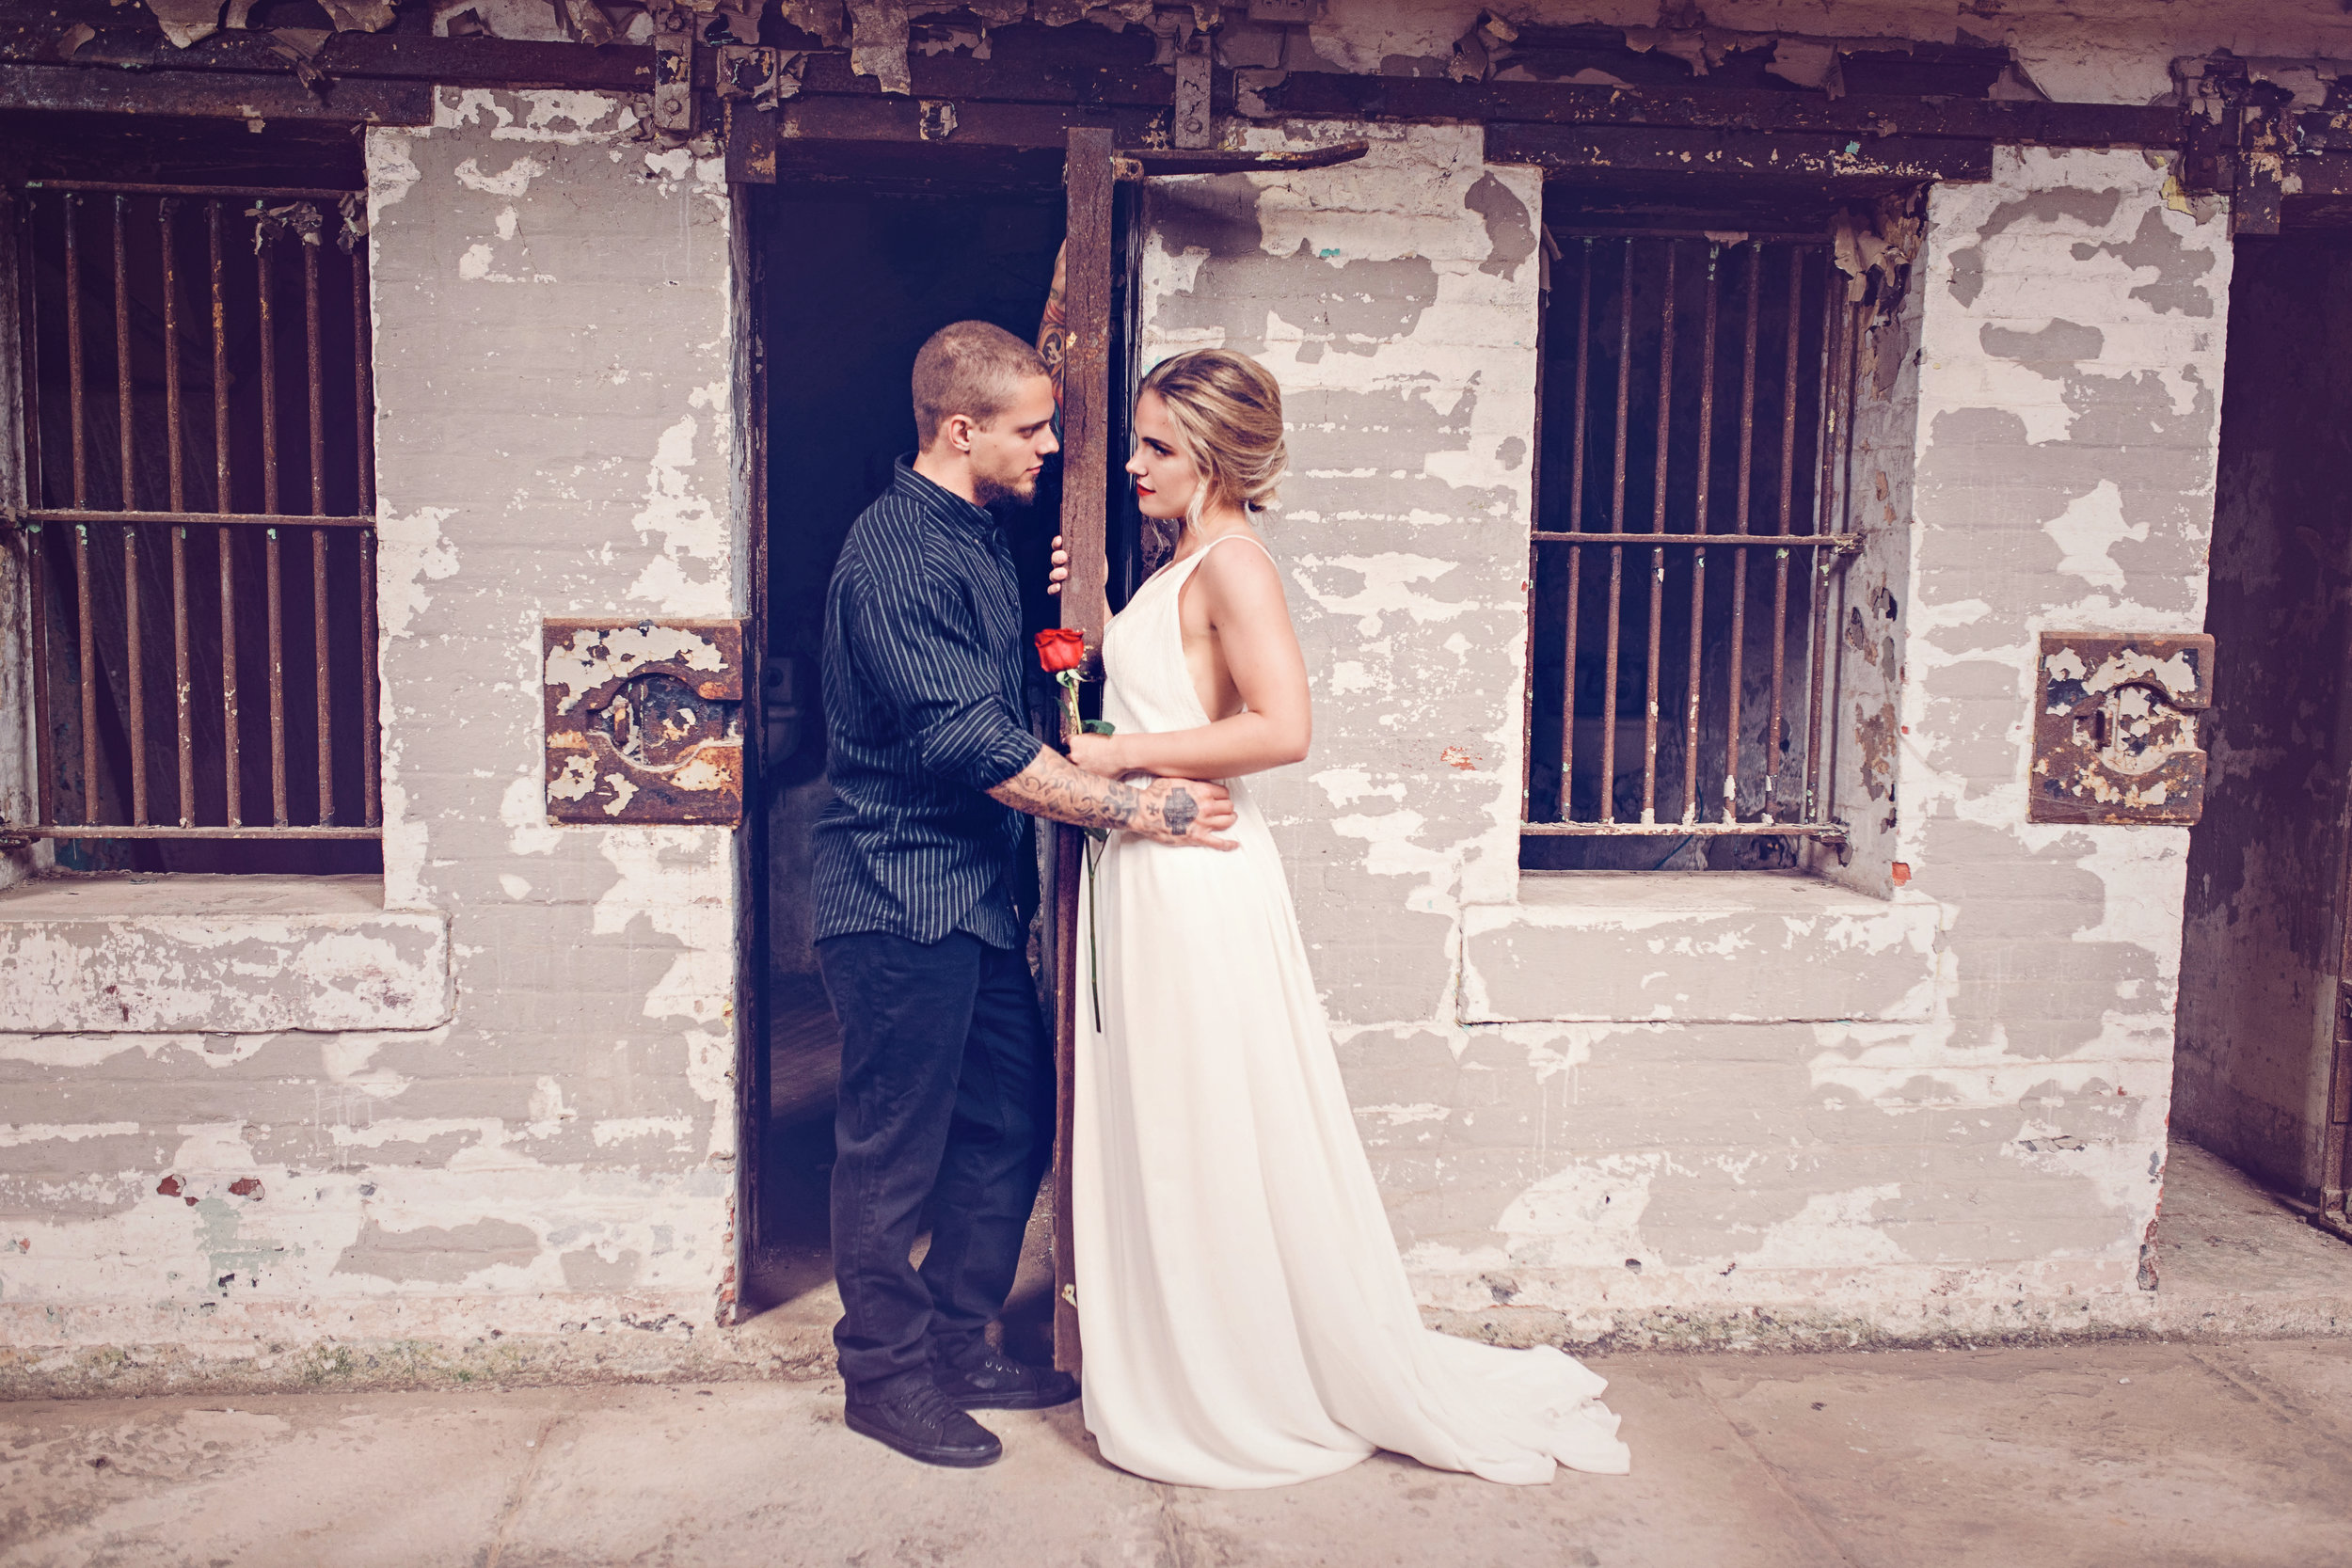 cincinnati wedding planning - columbus wedding coordinator - dayton wedding planning - elopement photography